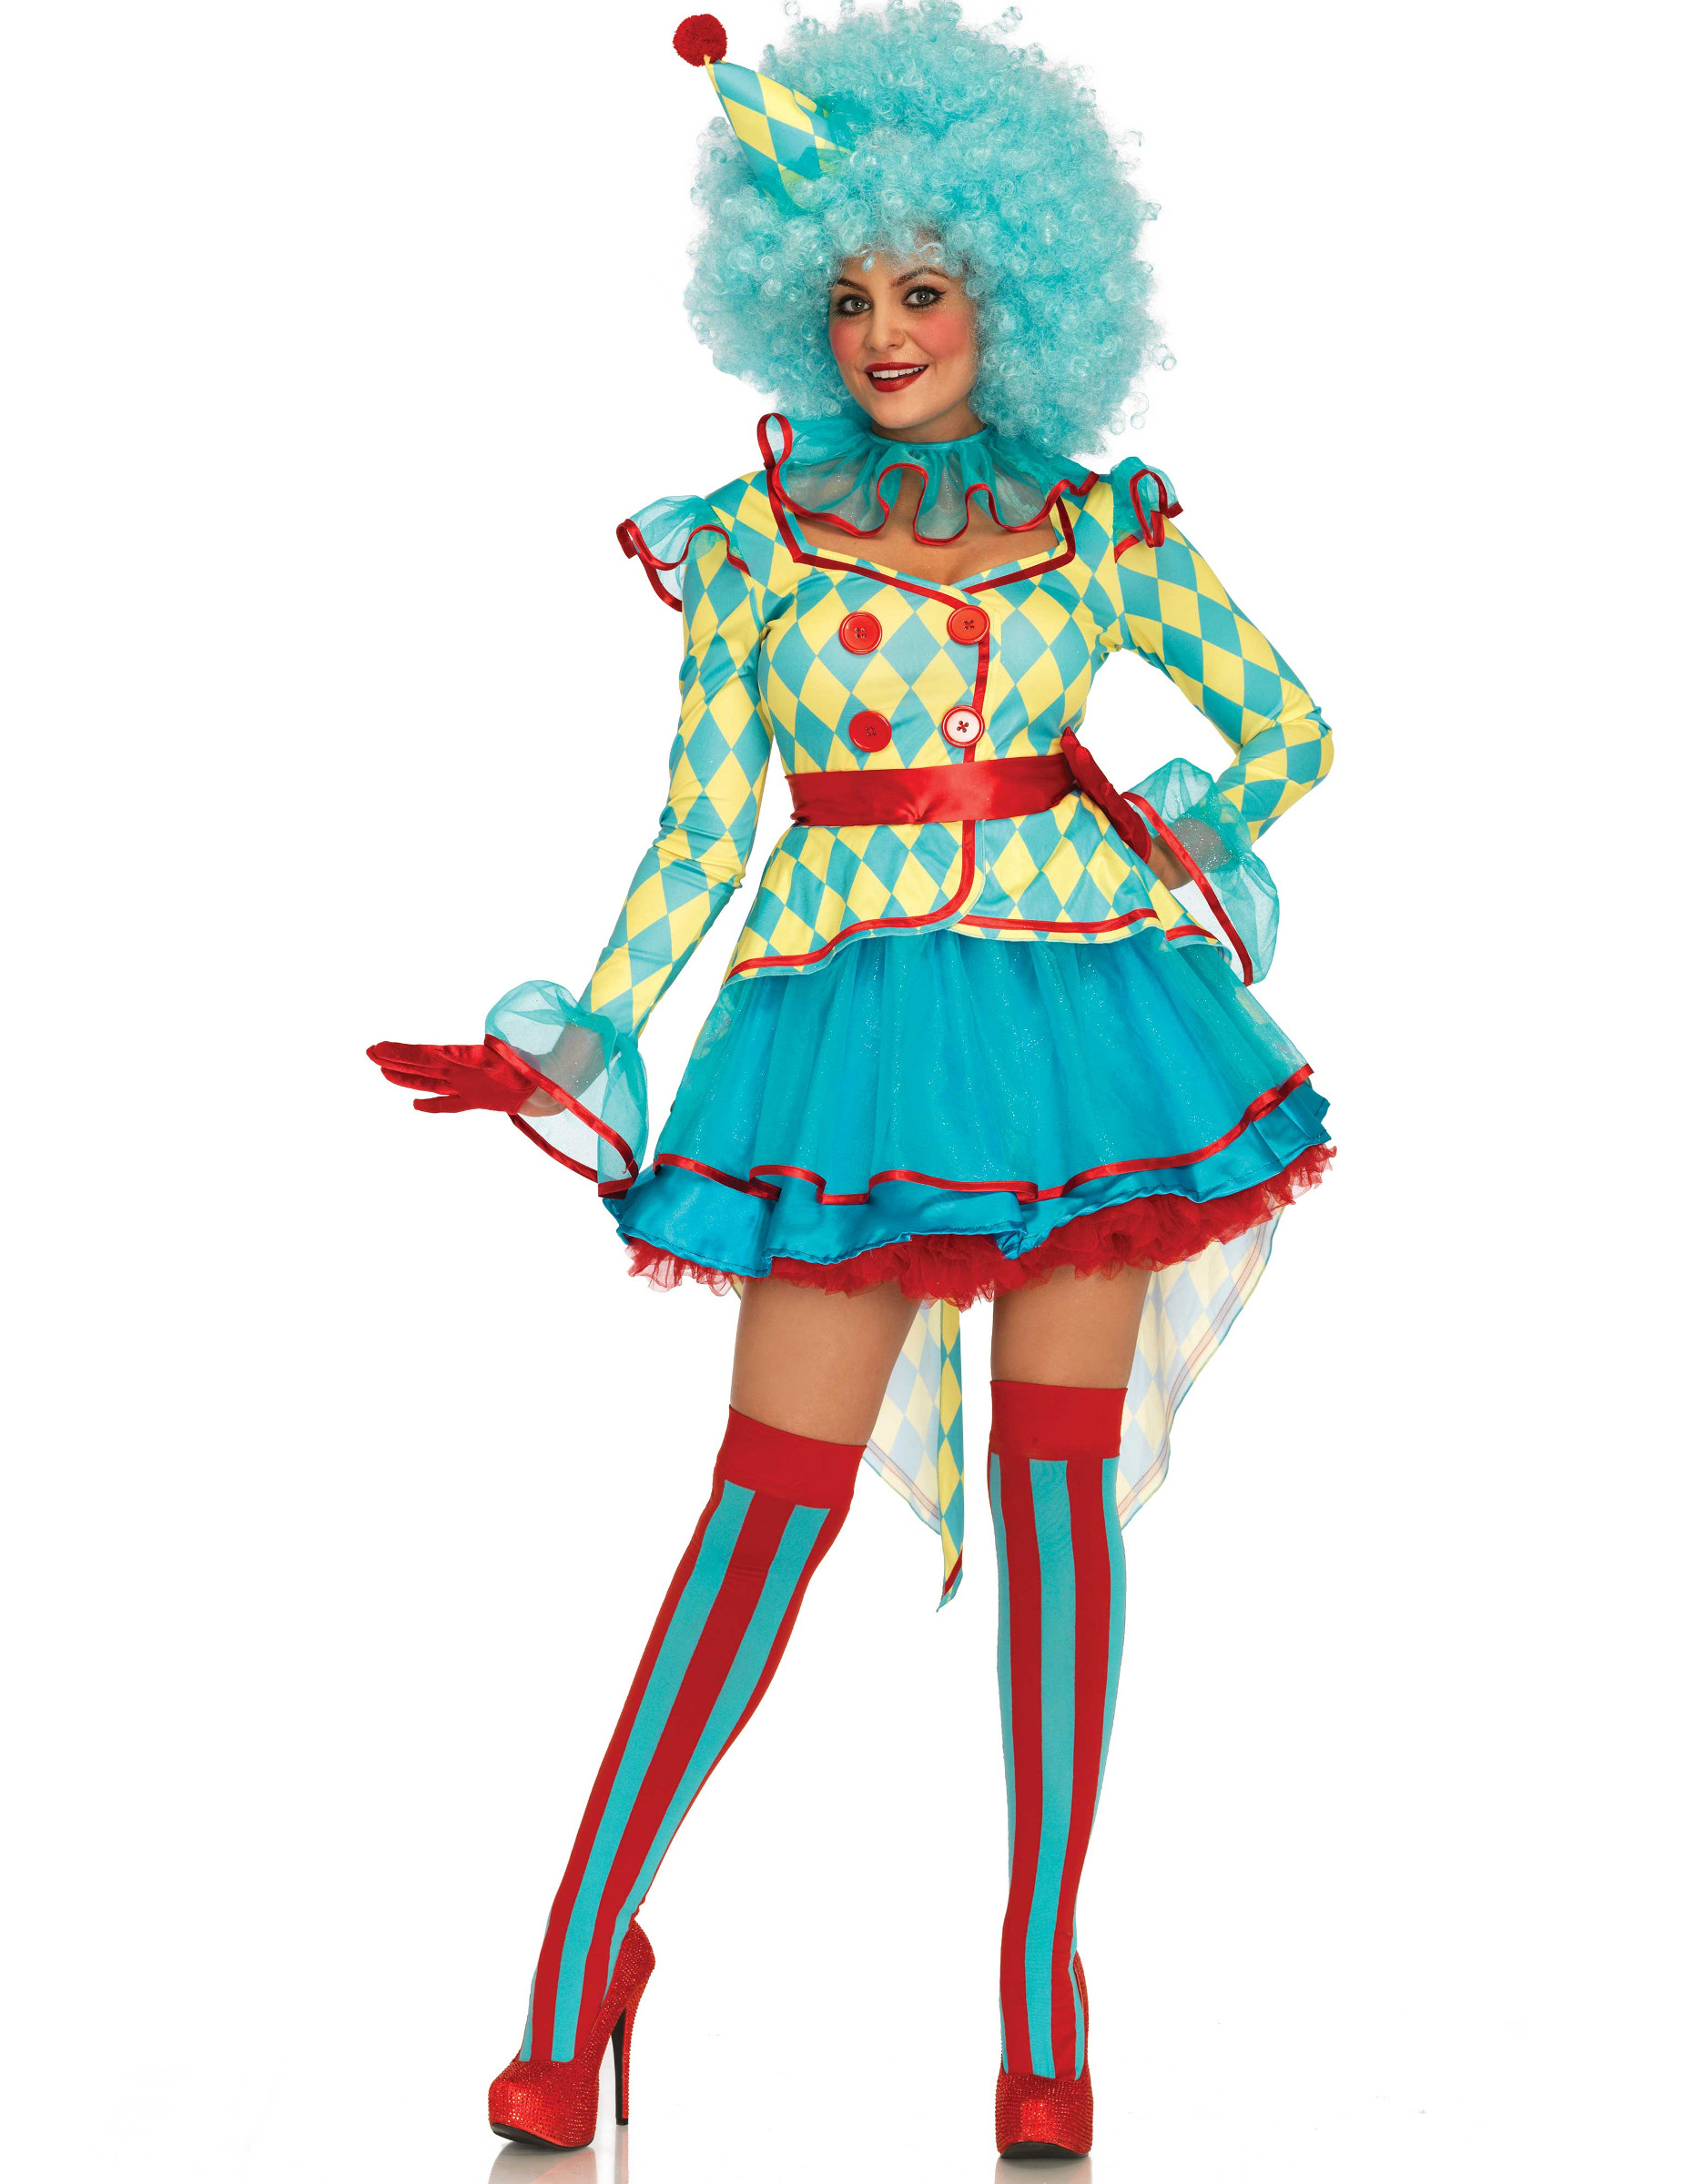 clowns kost m mit t t g nstige faschings kost me bei karneval megastore. Black Bedroom Furniture Sets. Home Design Ideas